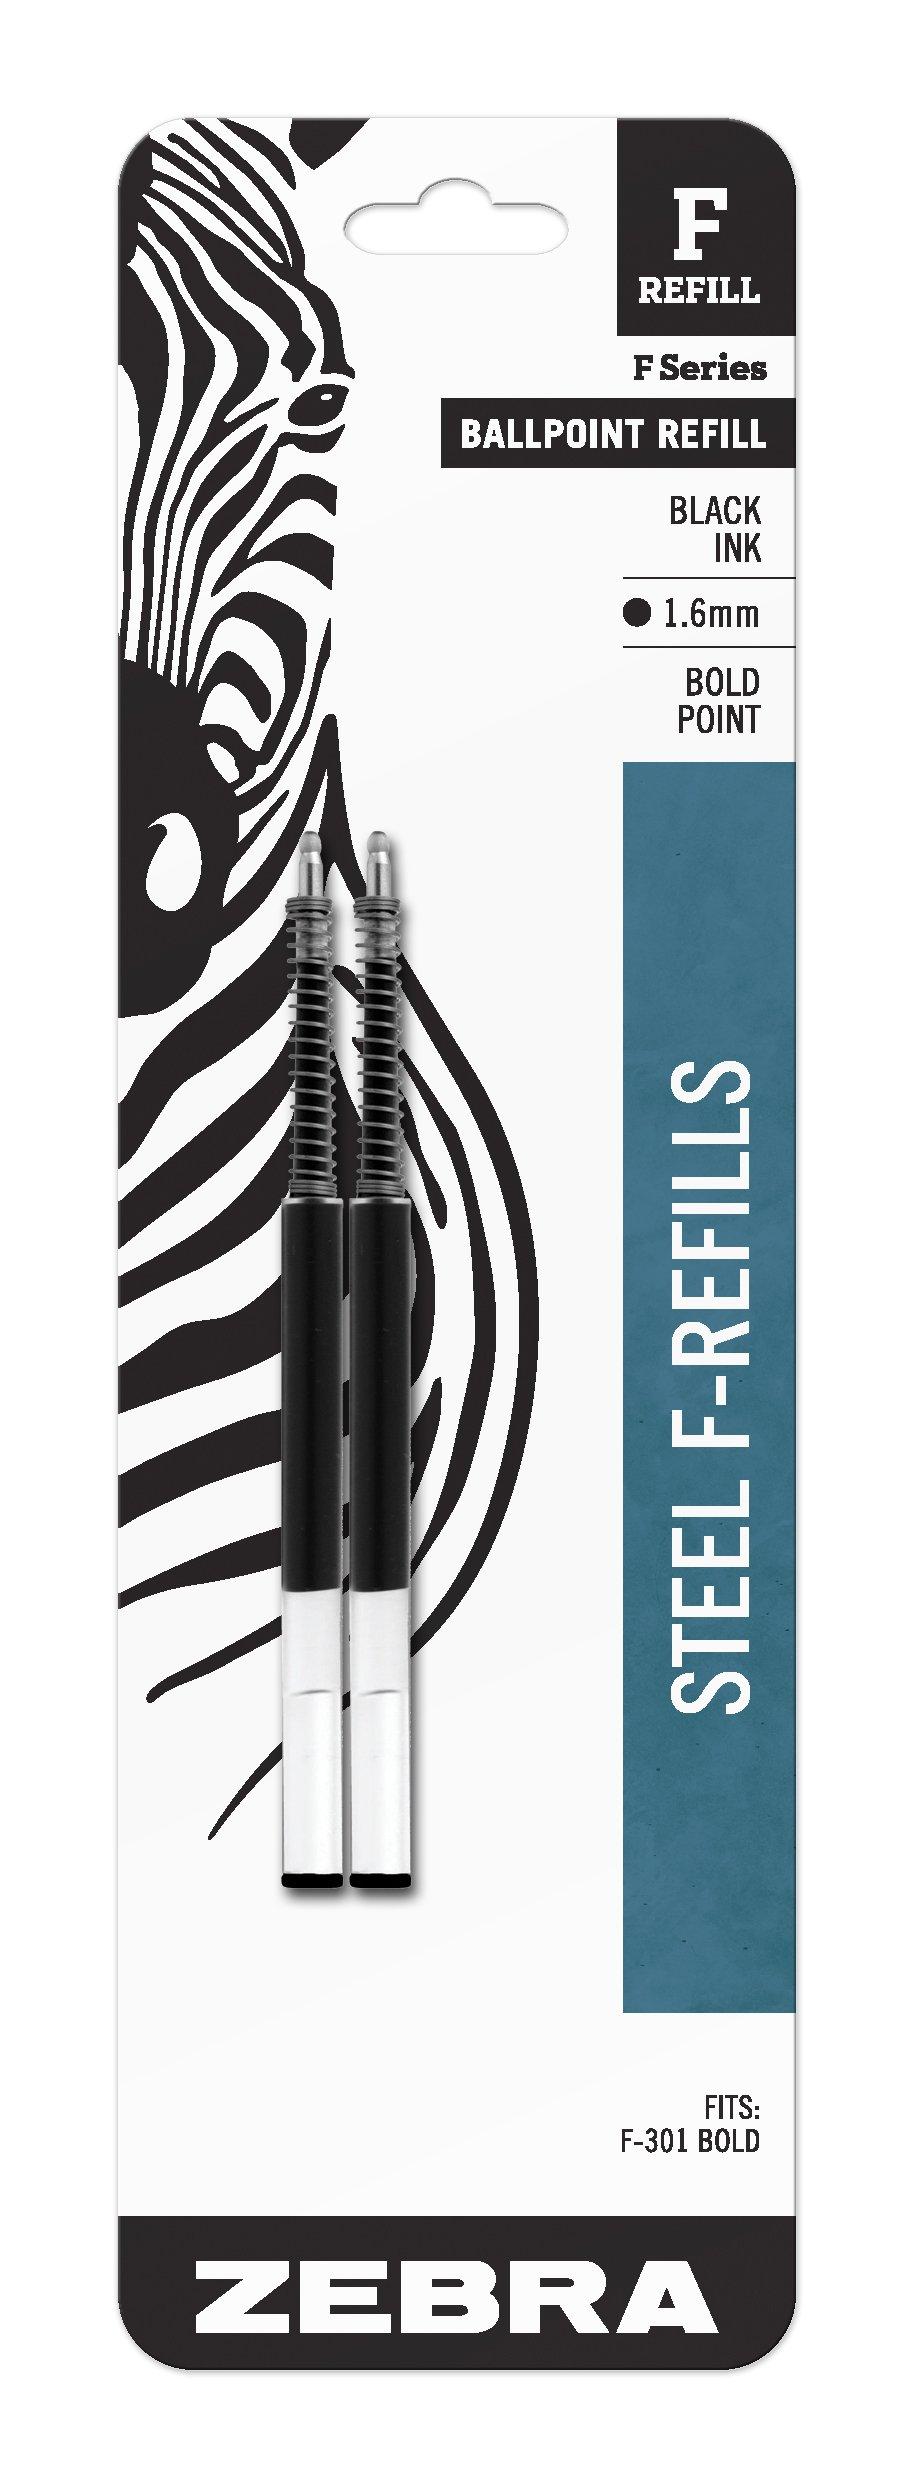 Zebra F-Series Ballpoint Stainless Steel Pen Refill, Bold Point, 1.6mm, Black Ink, 2-Count